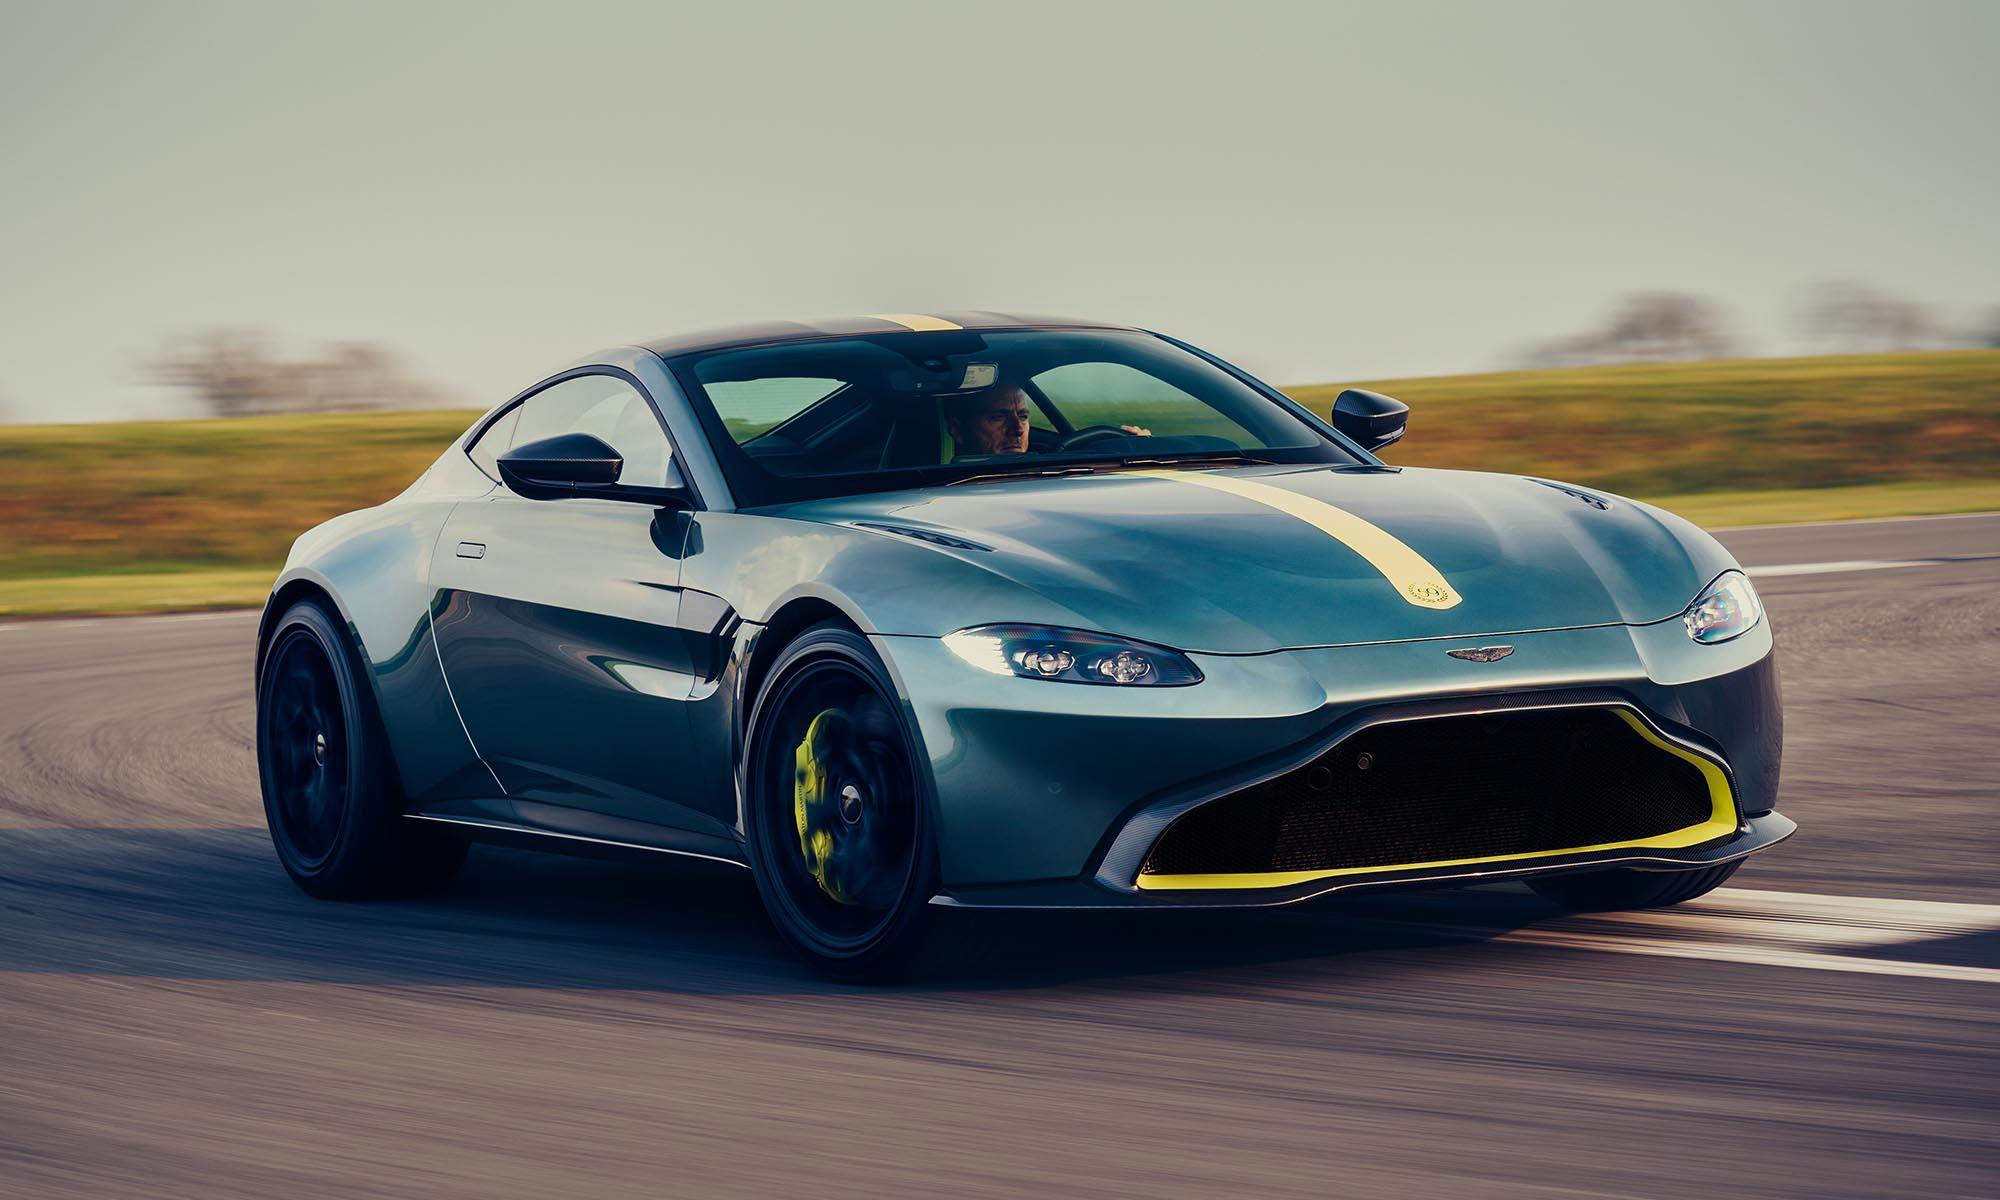 Aston Martin, Vantage, British luxury, seven speed, manual transmission, mercedes, vulcan, james bond, spectre, film, graziano, luxury car, top car, best sports car, sports car, luxury, billionaire